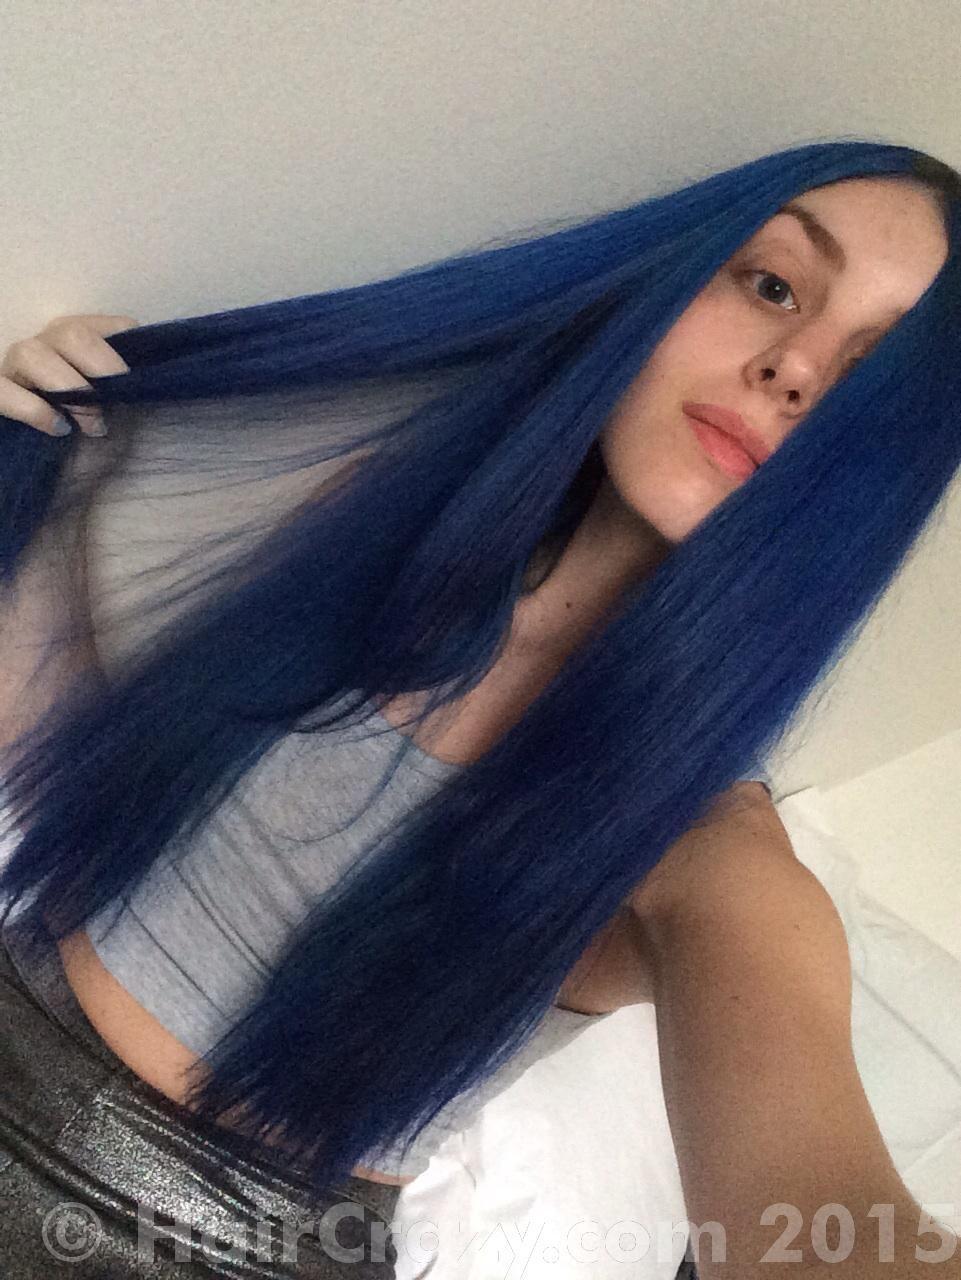 Glittervindar Adore Royal Navy Adore Hair Dye Navy Hair